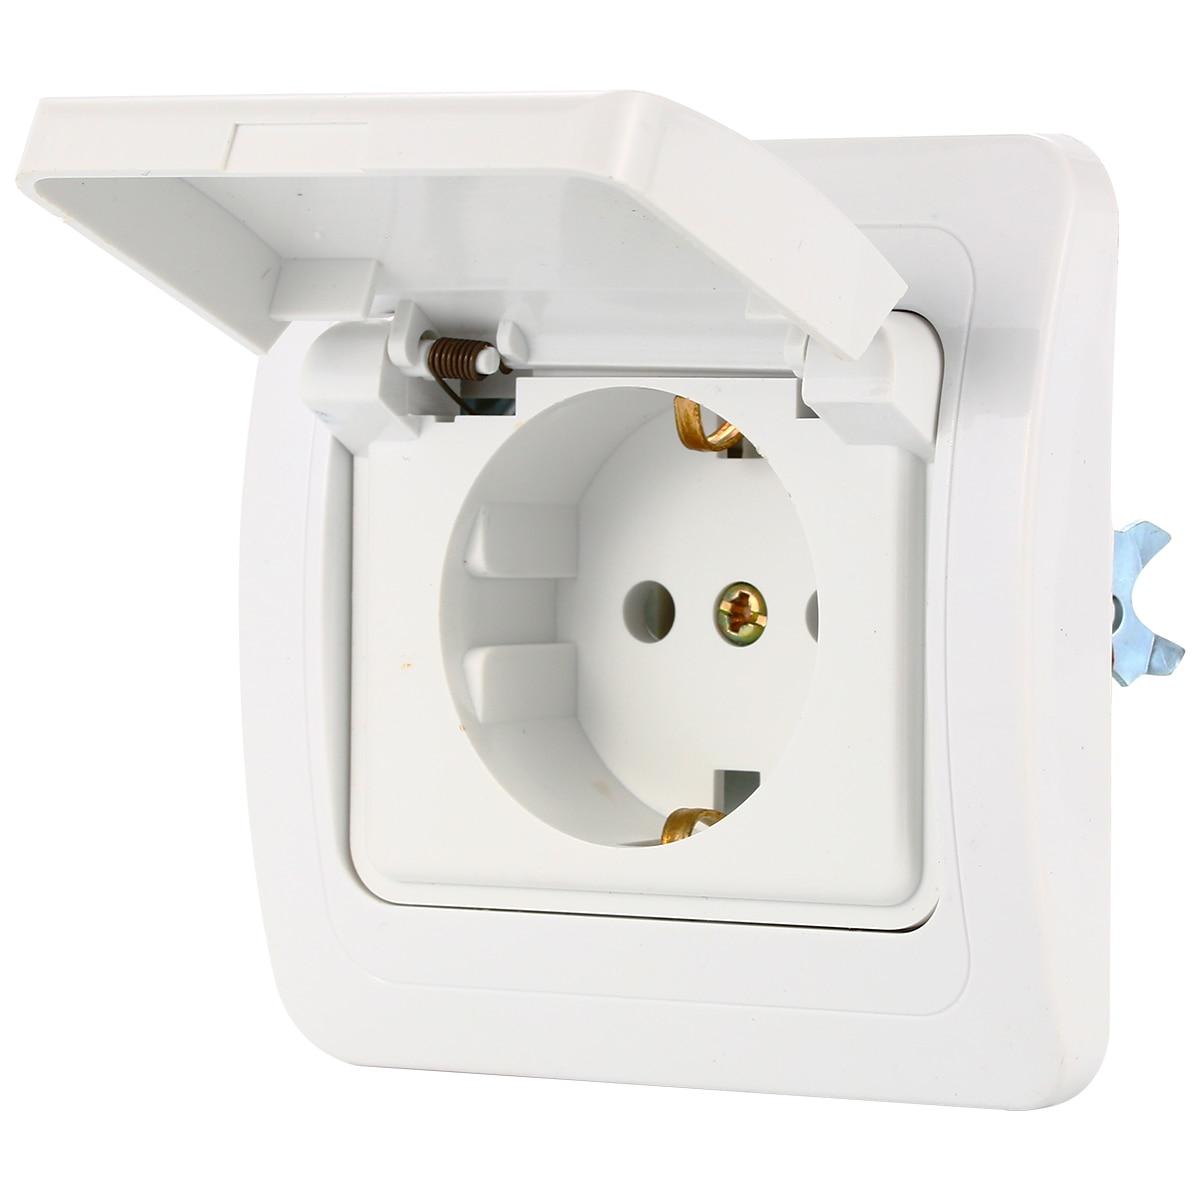 germany european ac power socket 16a 250v korea wiring receptacle power outlet schuko bi132 on aliexpress com alibaba group [ 1200 x 1200 Pixel ]